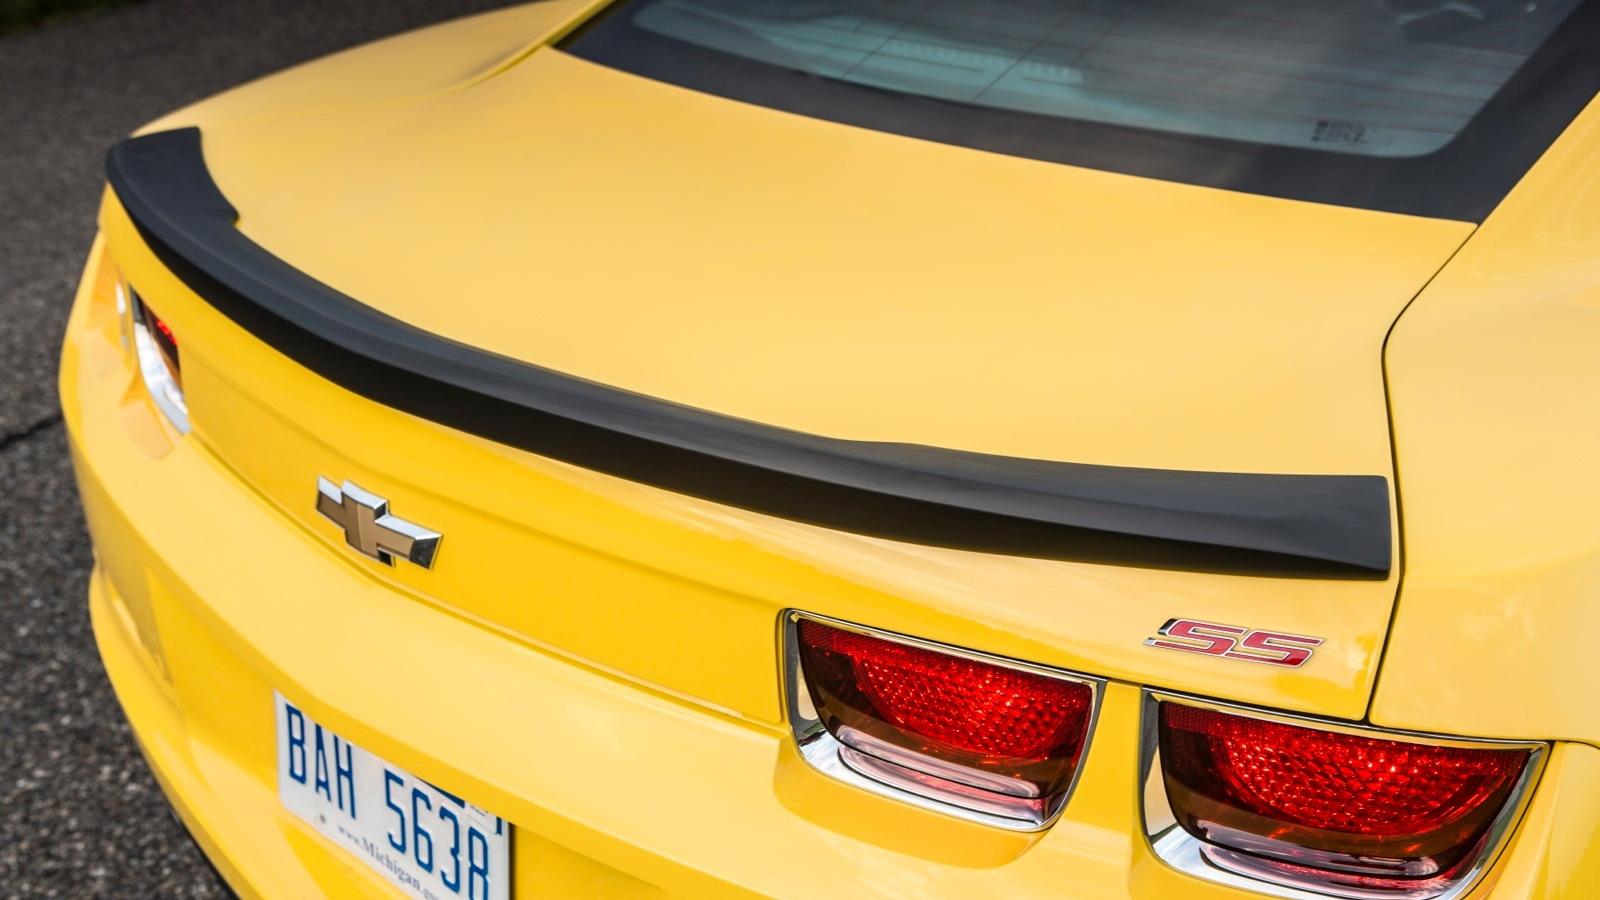 2013 Chevrolet Camaro SS 1LE